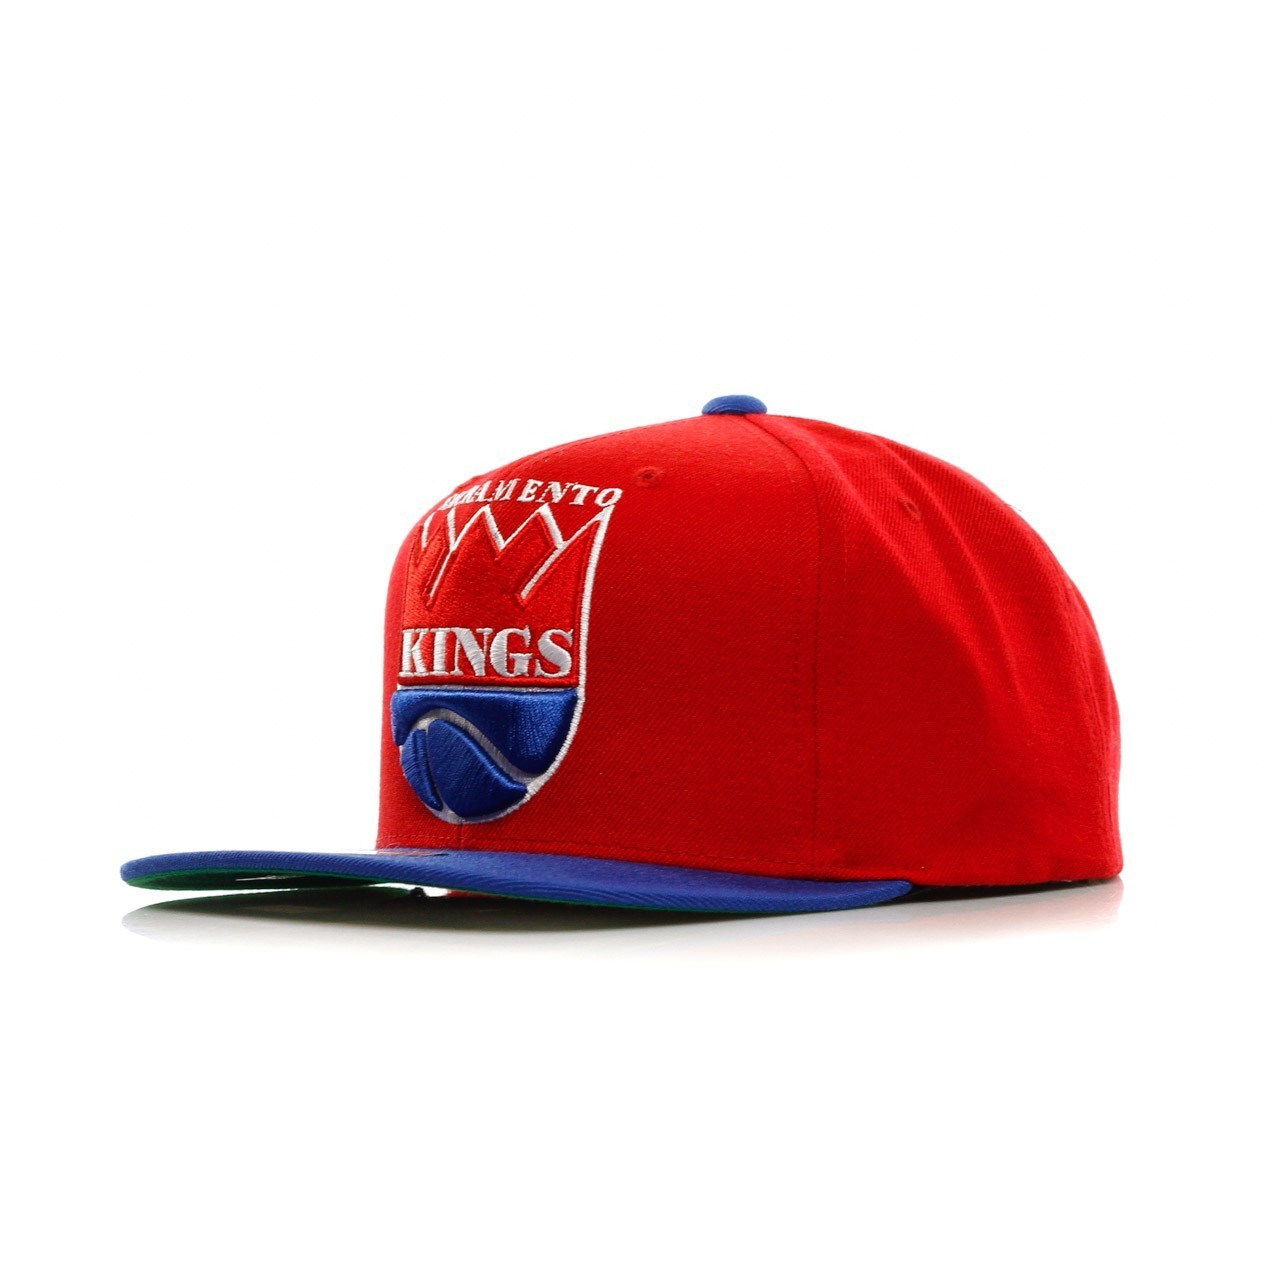 MITCHELL & NESS NBA XL LOGO 2 TONE SNAPBACK SACKIN MN-HWC-NJ16Z-5KINGS-MTC